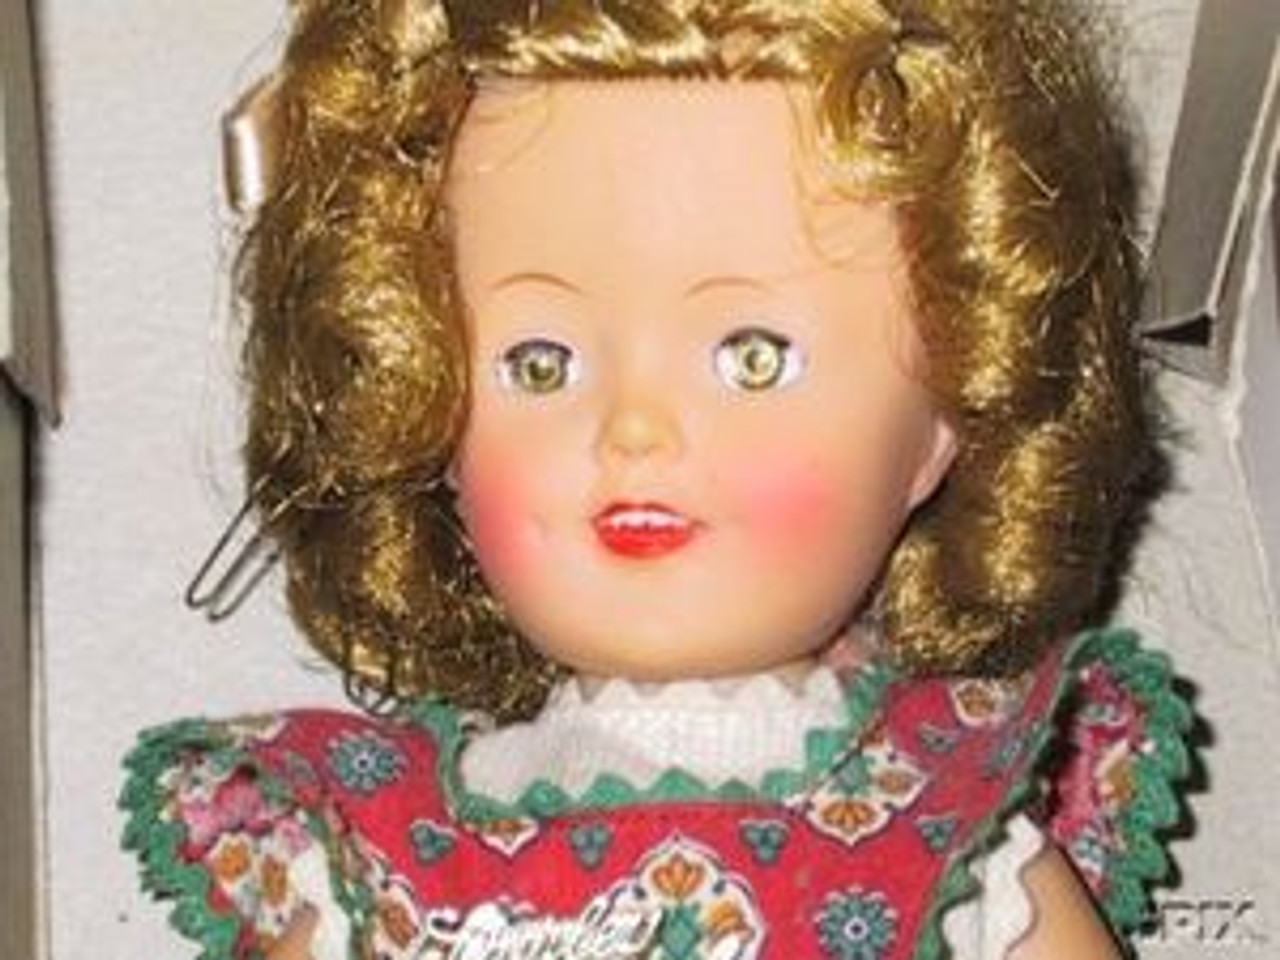 Fifty's Blond 53 KatSilk Saran Doll Hair